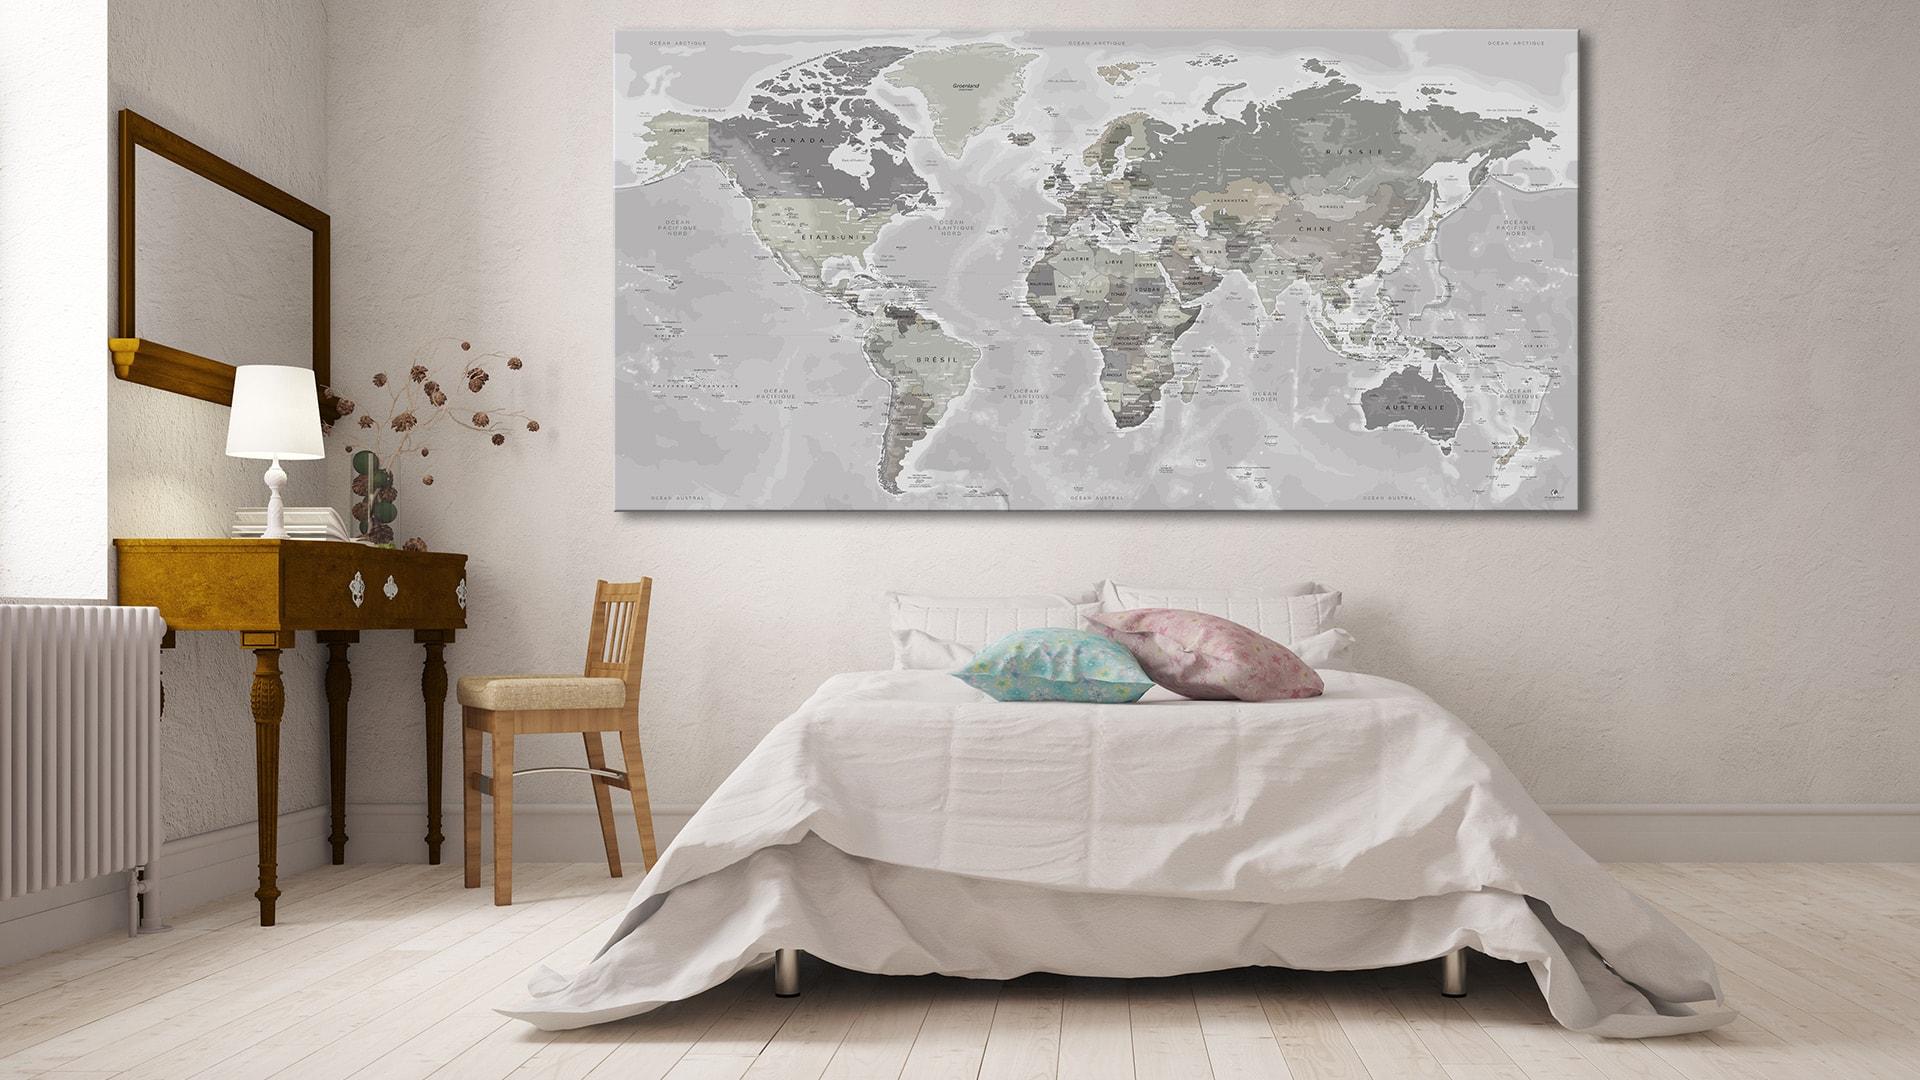 mappemonde murale carte du monde g ante jour original map. Black Bedroom Furniture Sets. Home Design Ideas